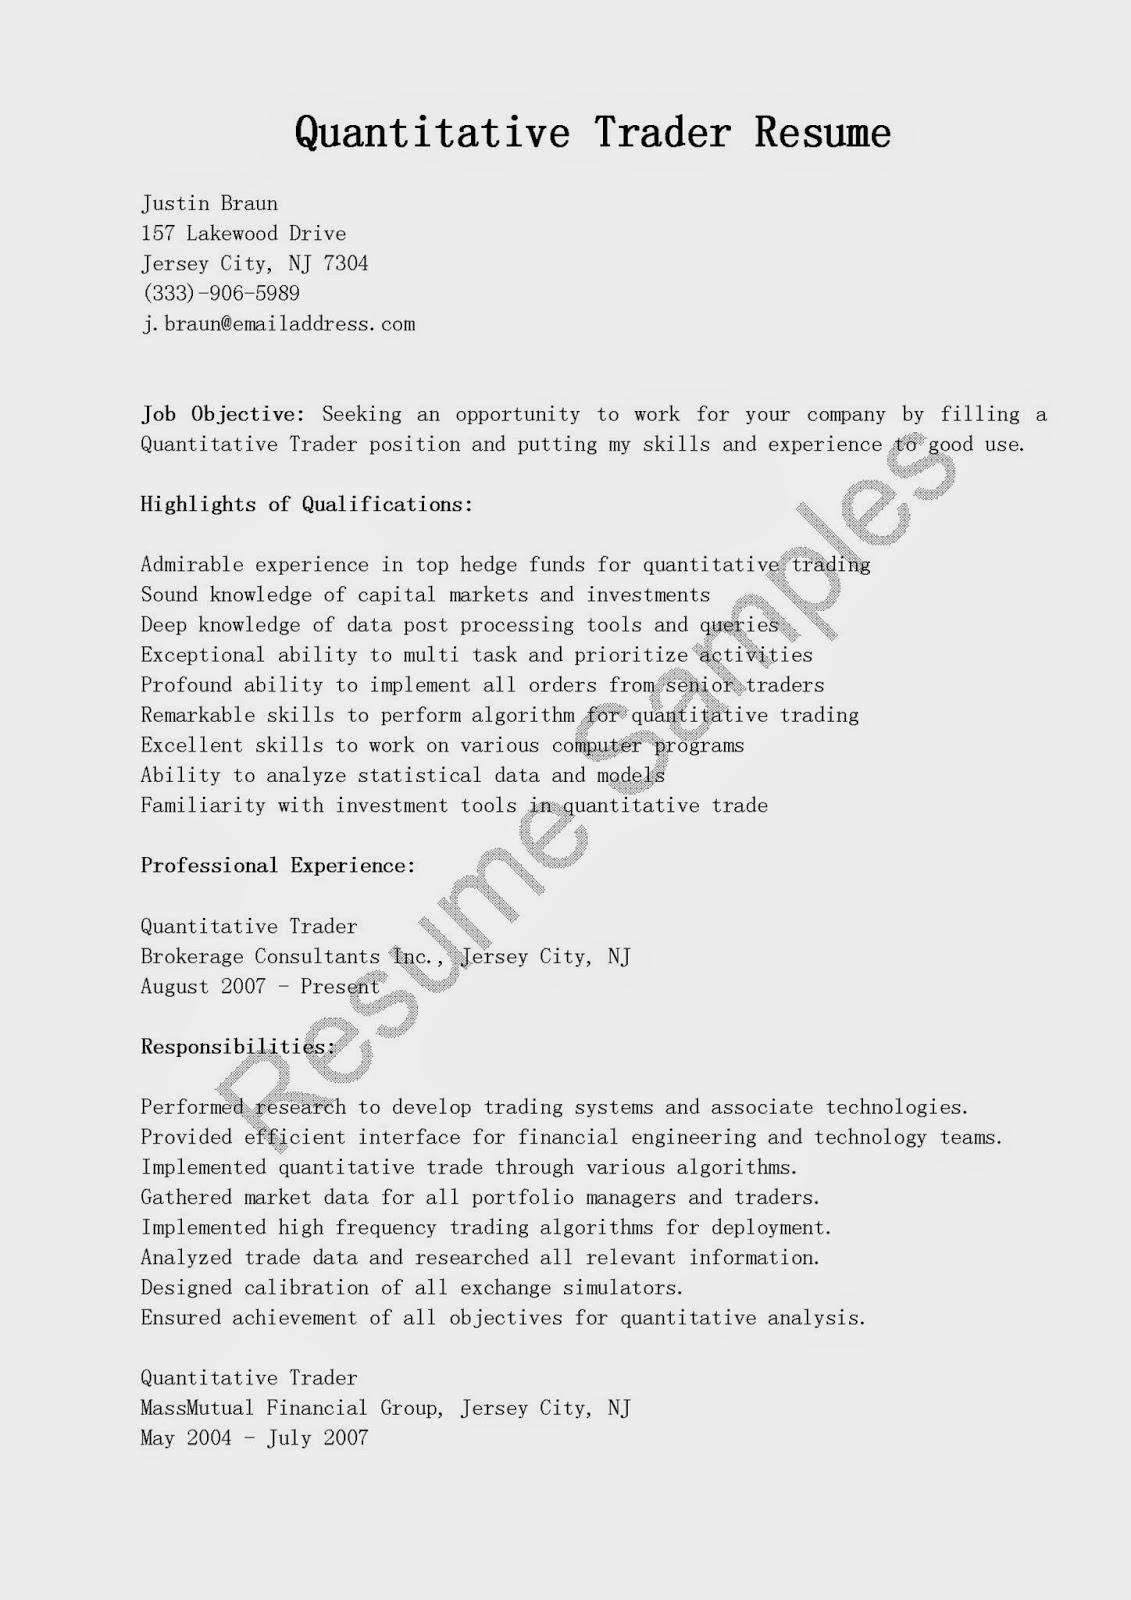 resume samples  quantitative trader resume sample